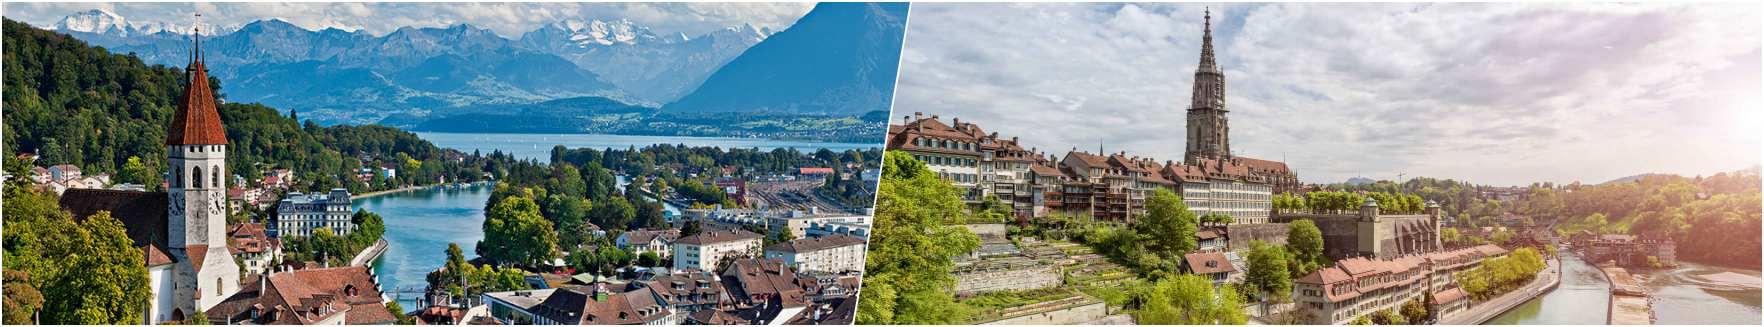 Interlaken - Bern